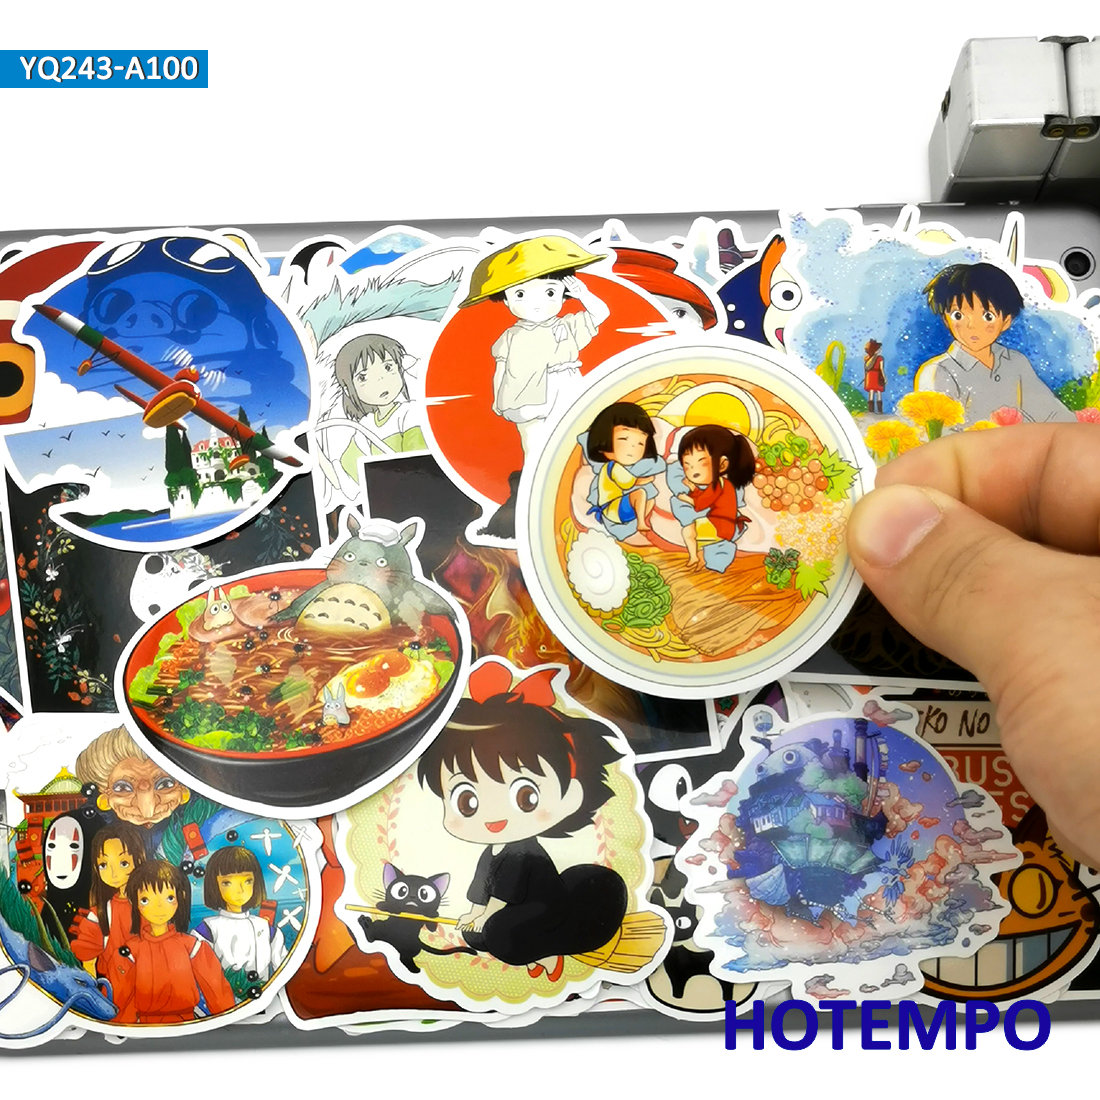 100pcs Manga Miyazaki Hayao Classic Cute Anime Movie Stickers Toy For Kid Mobile Phone Laptop Luggage Skateboard Cartoon Sticker